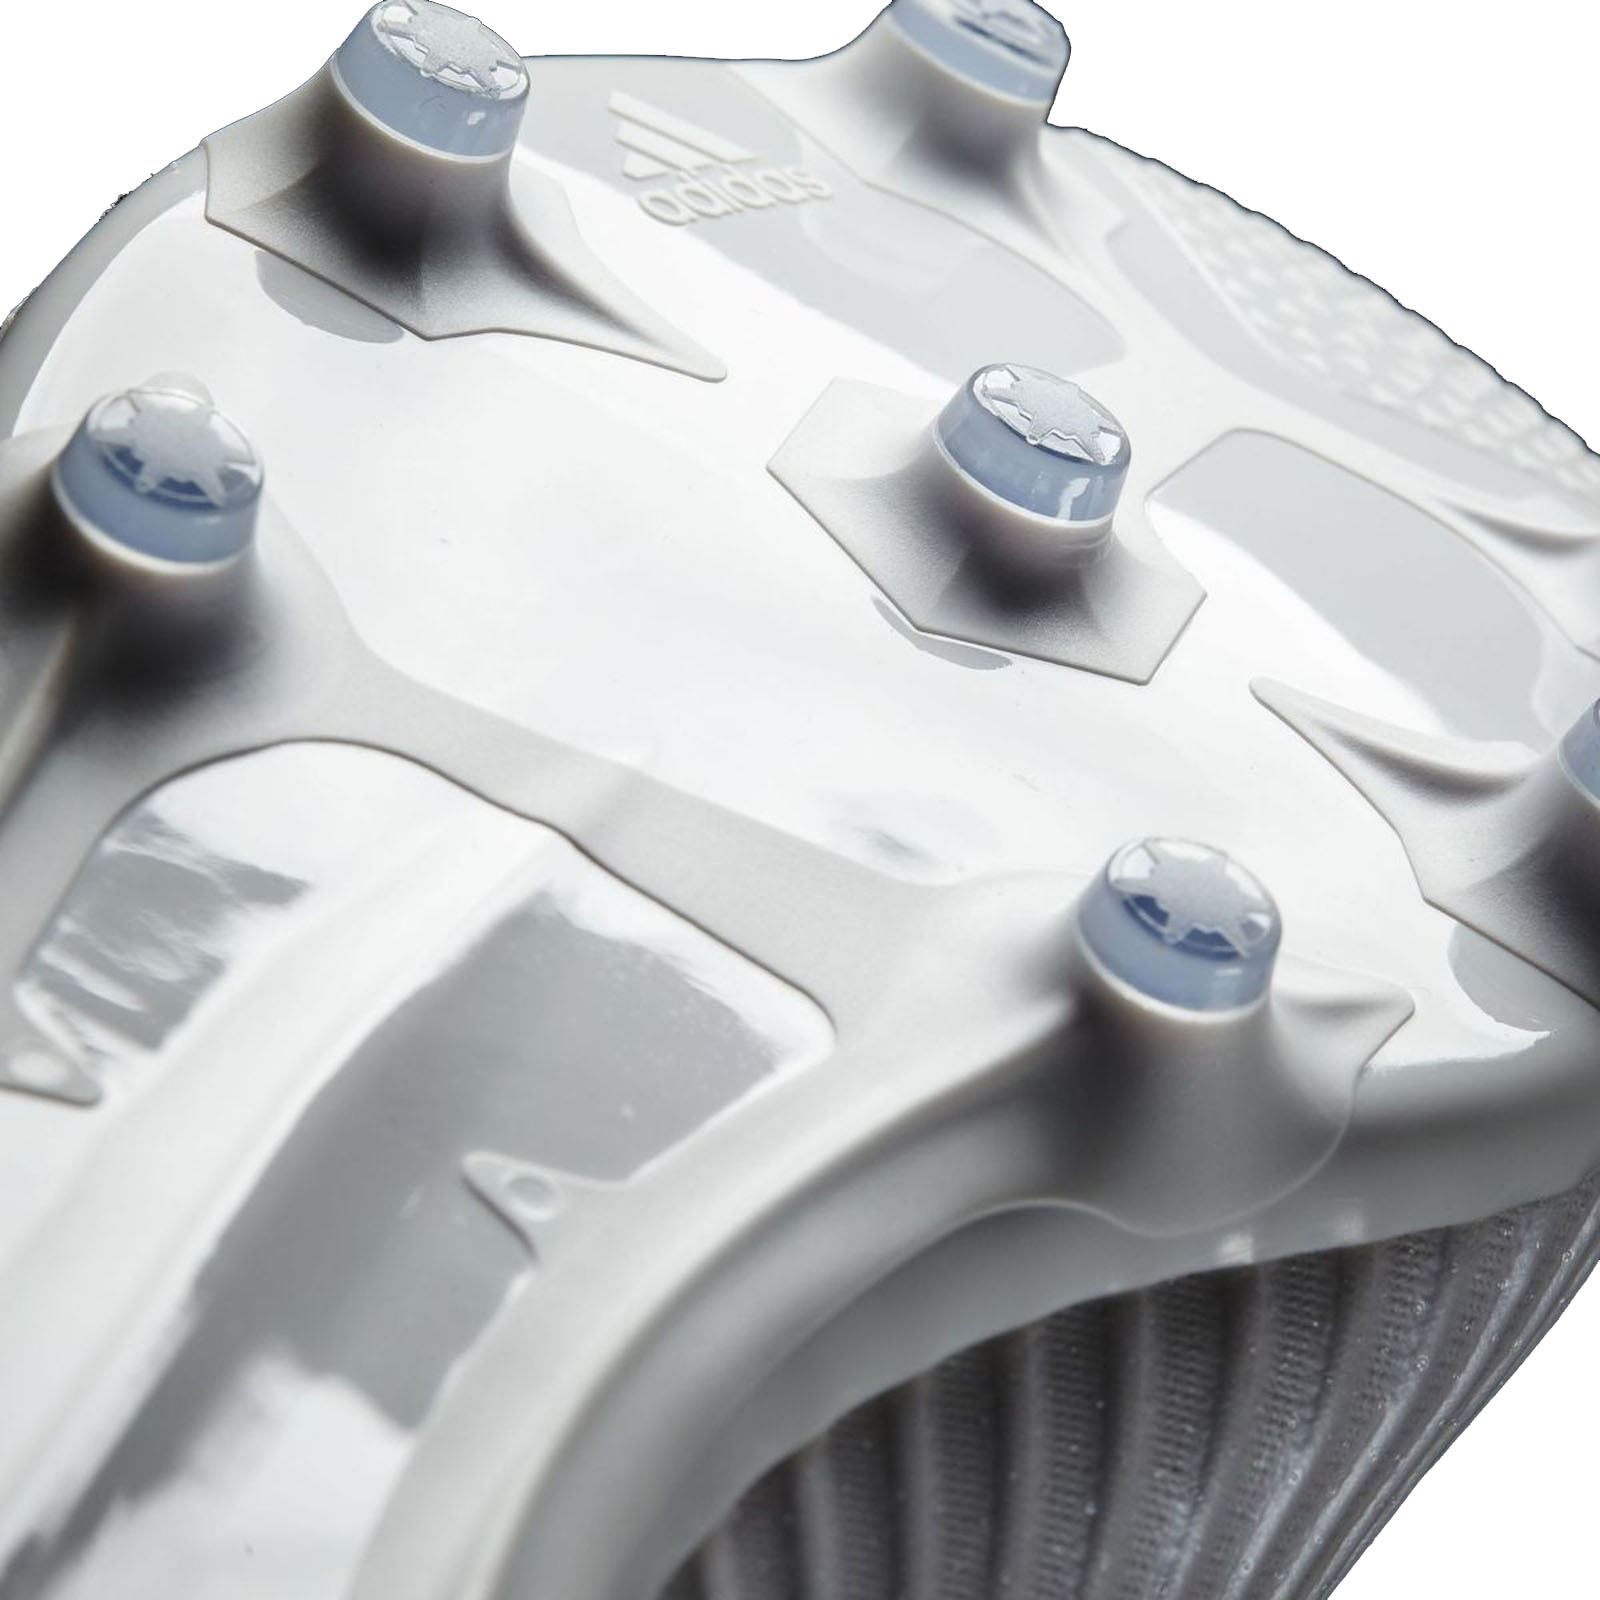 adidas-Ace-17-2-Primemesh-Mens-FG-Football-Boots-Soccer-RRP-100-SAVE-039-S thumbnail 14